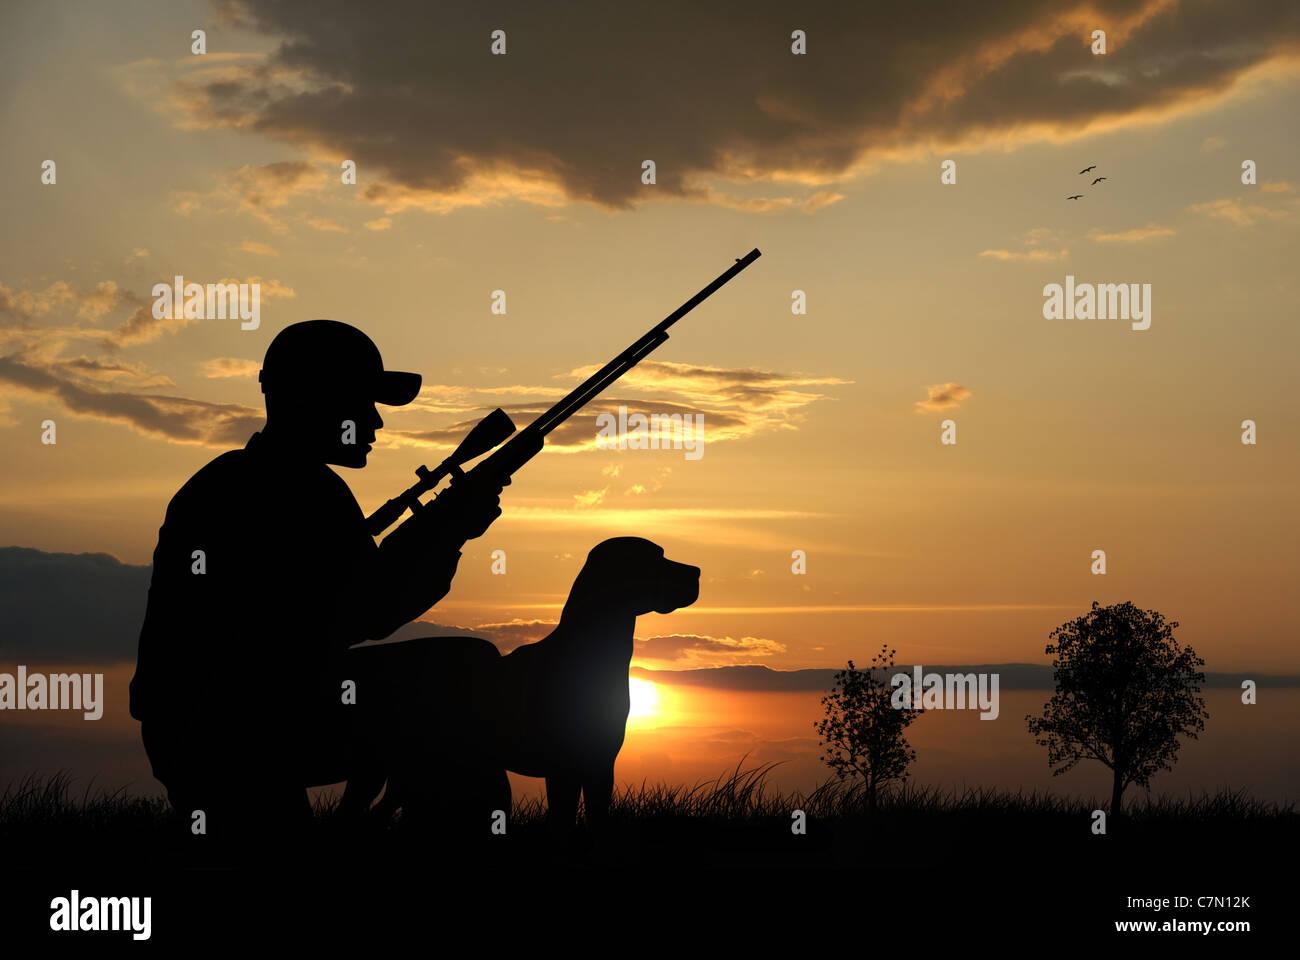 Cazador con su perro siluetas en sunset antecedentes Imagen De Stock